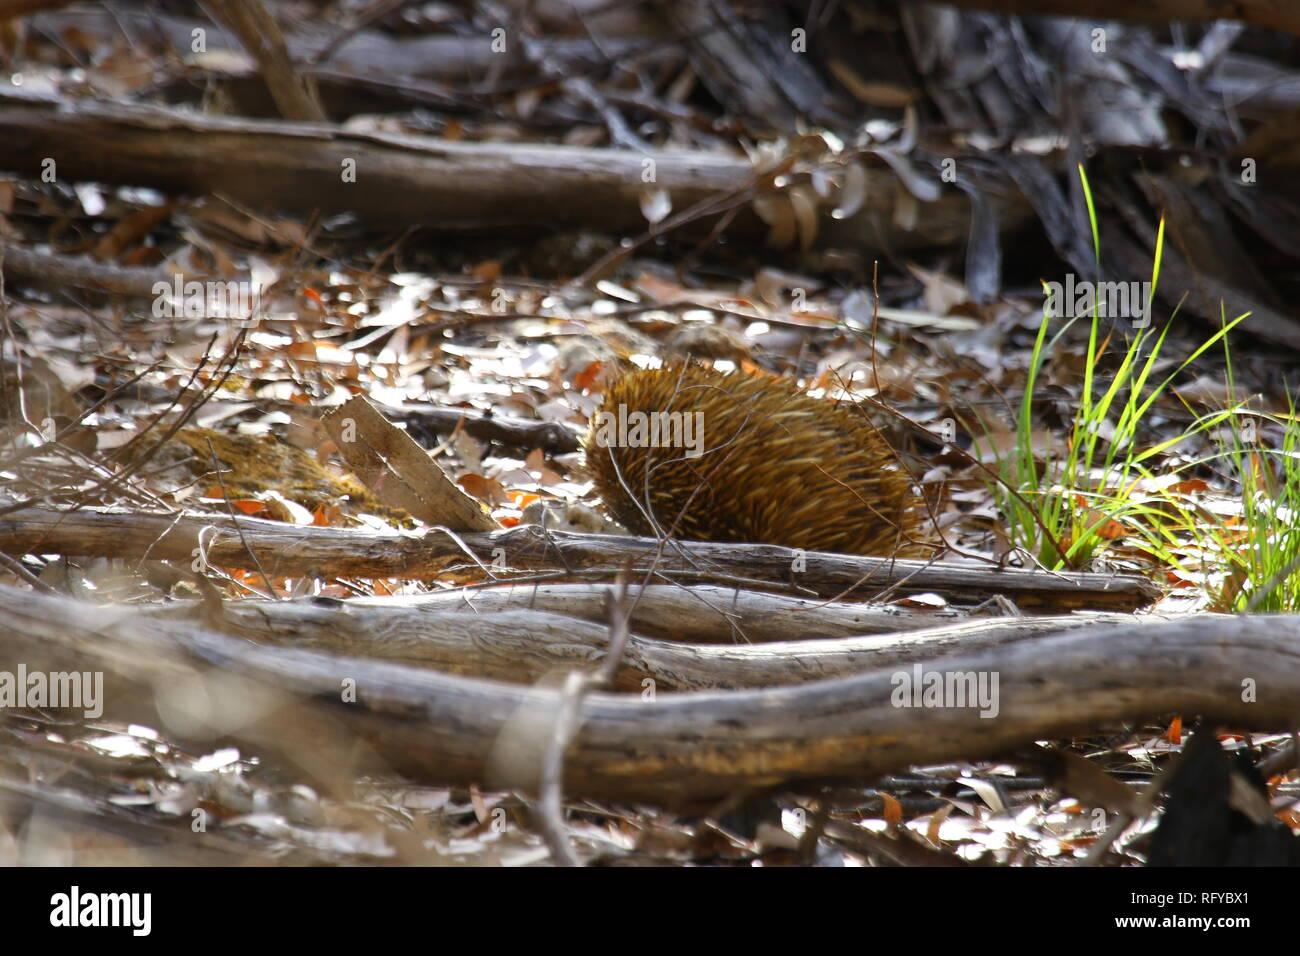 Australia Ant Hedgehog Ameisenigel Australien - Stock Image